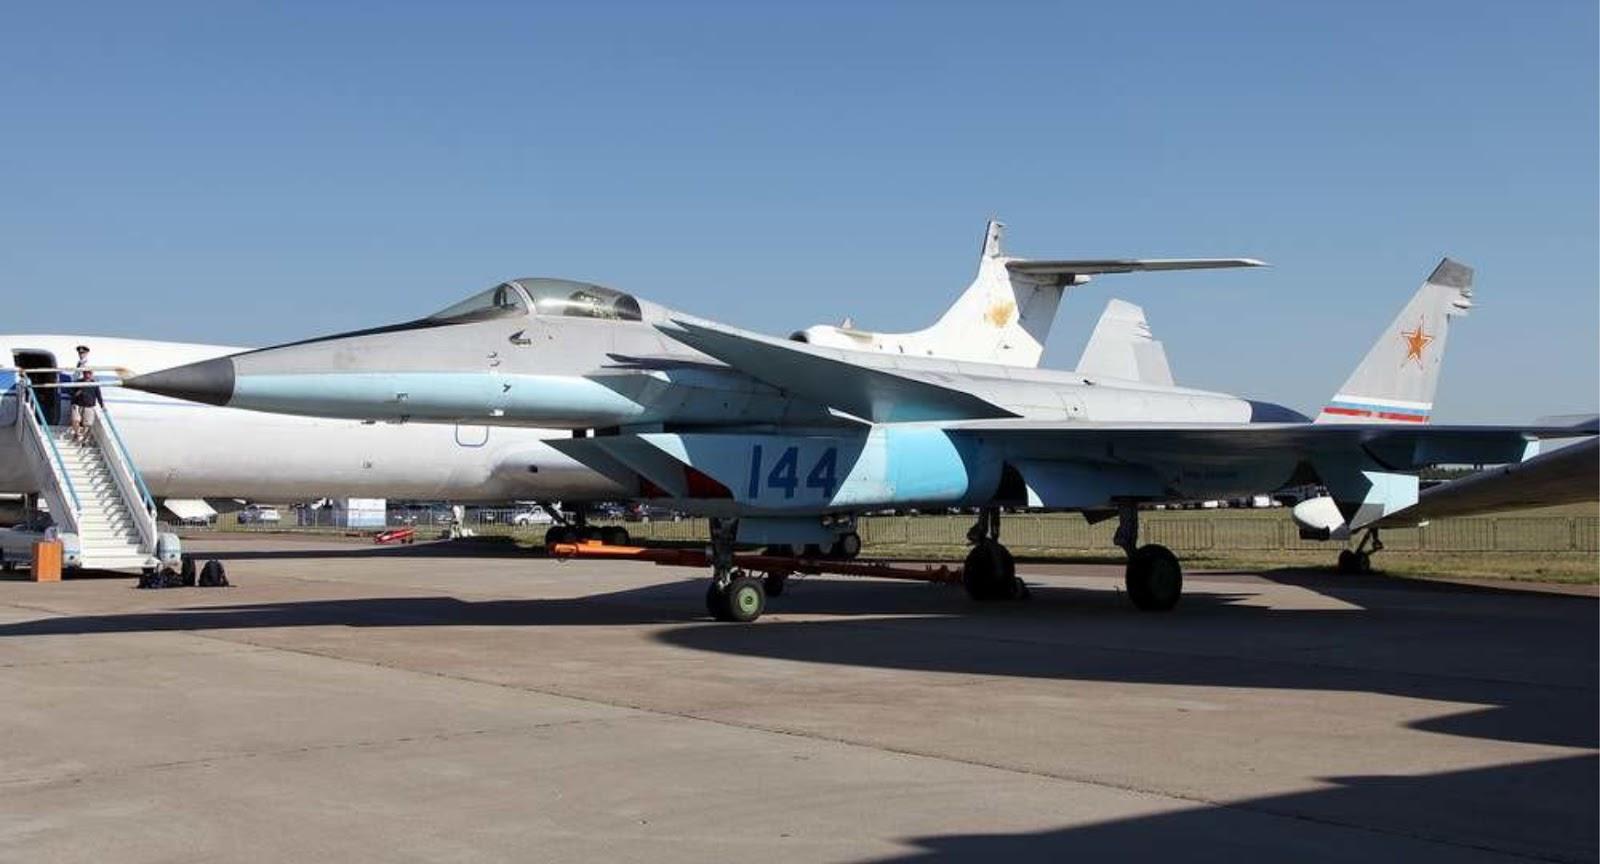 Bagaimana keruntuhan Uni Soviet mempengaruhi pesawat MiG 1,44